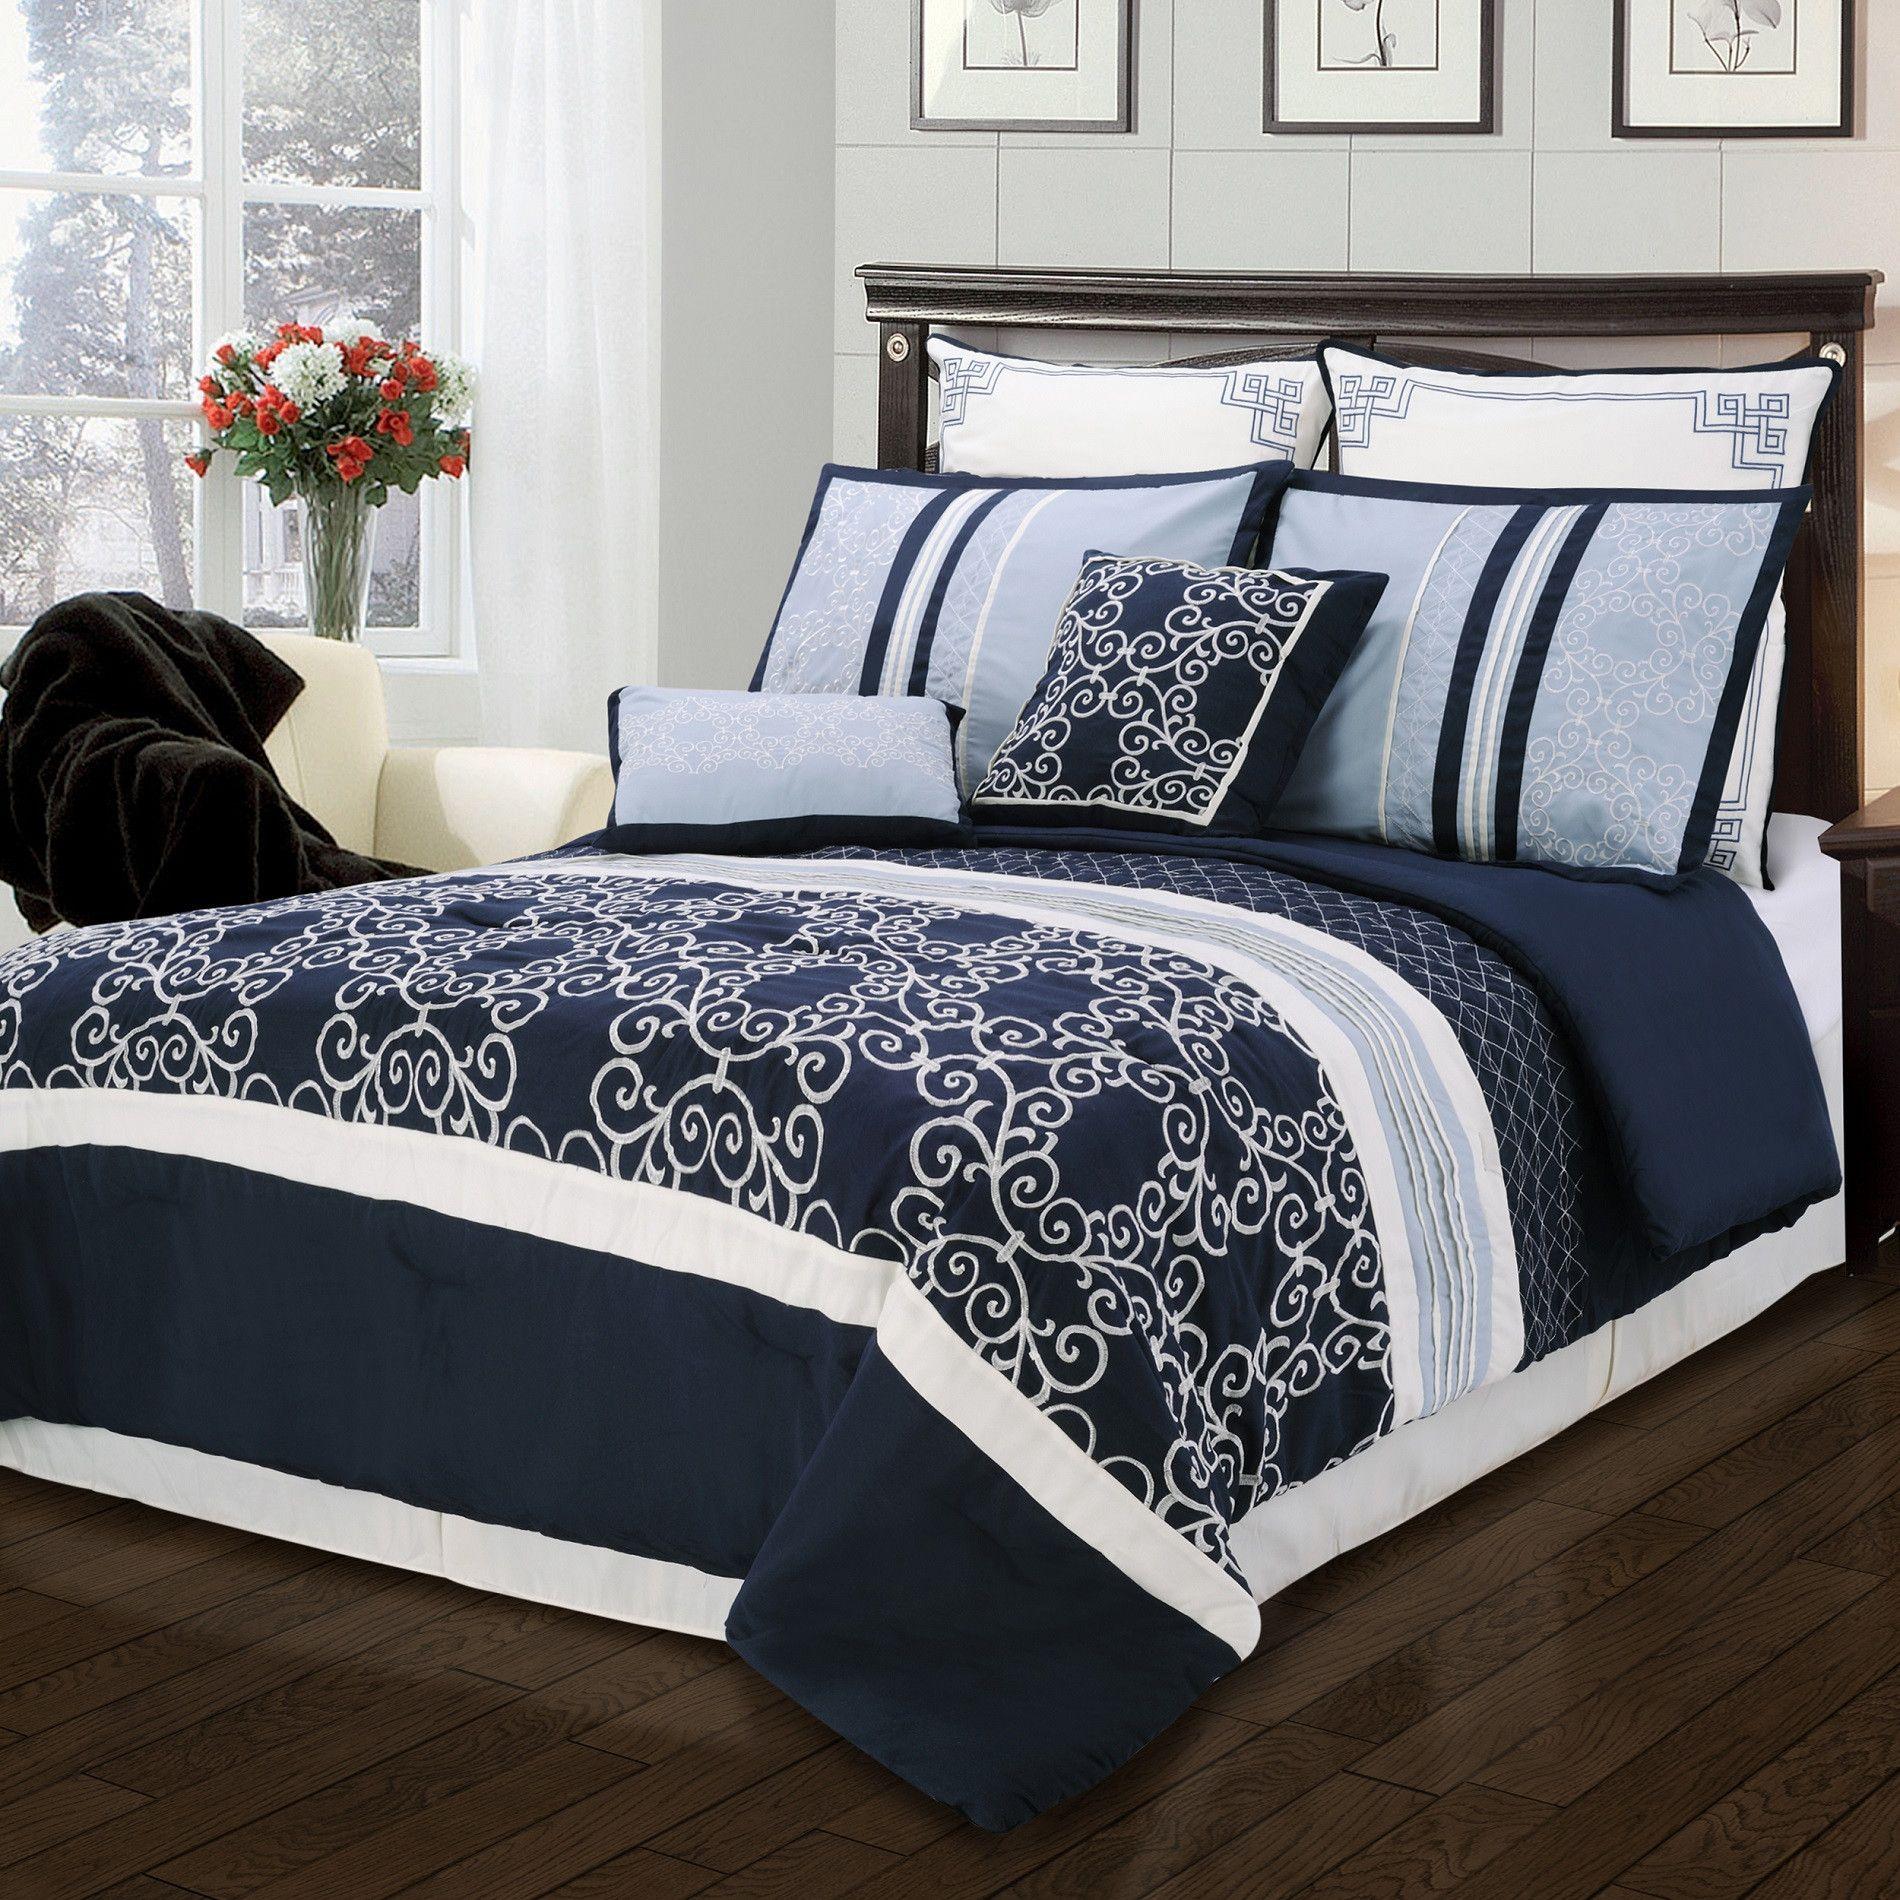 Simple Luxury Clarissa 8 Piece Comforter Set Comforter